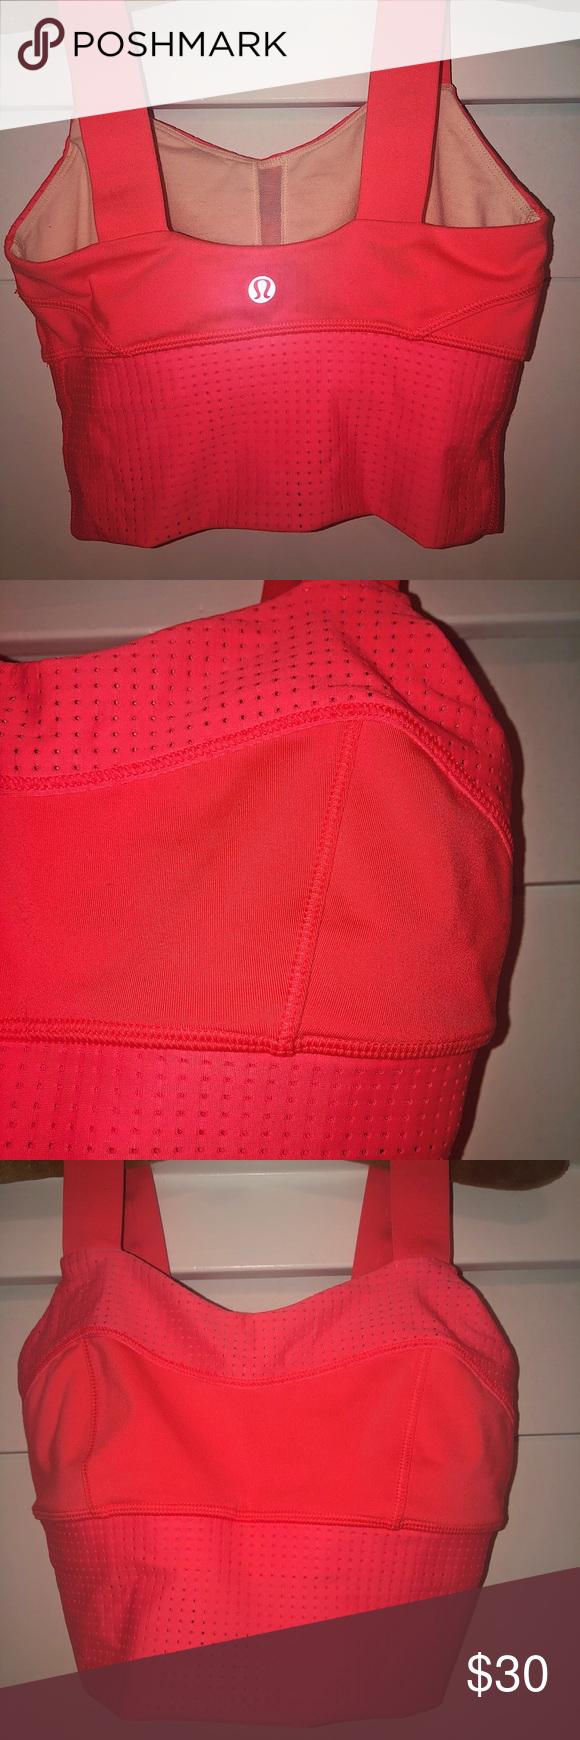 Neon coral long sports bra from lululemon Fun lululemon